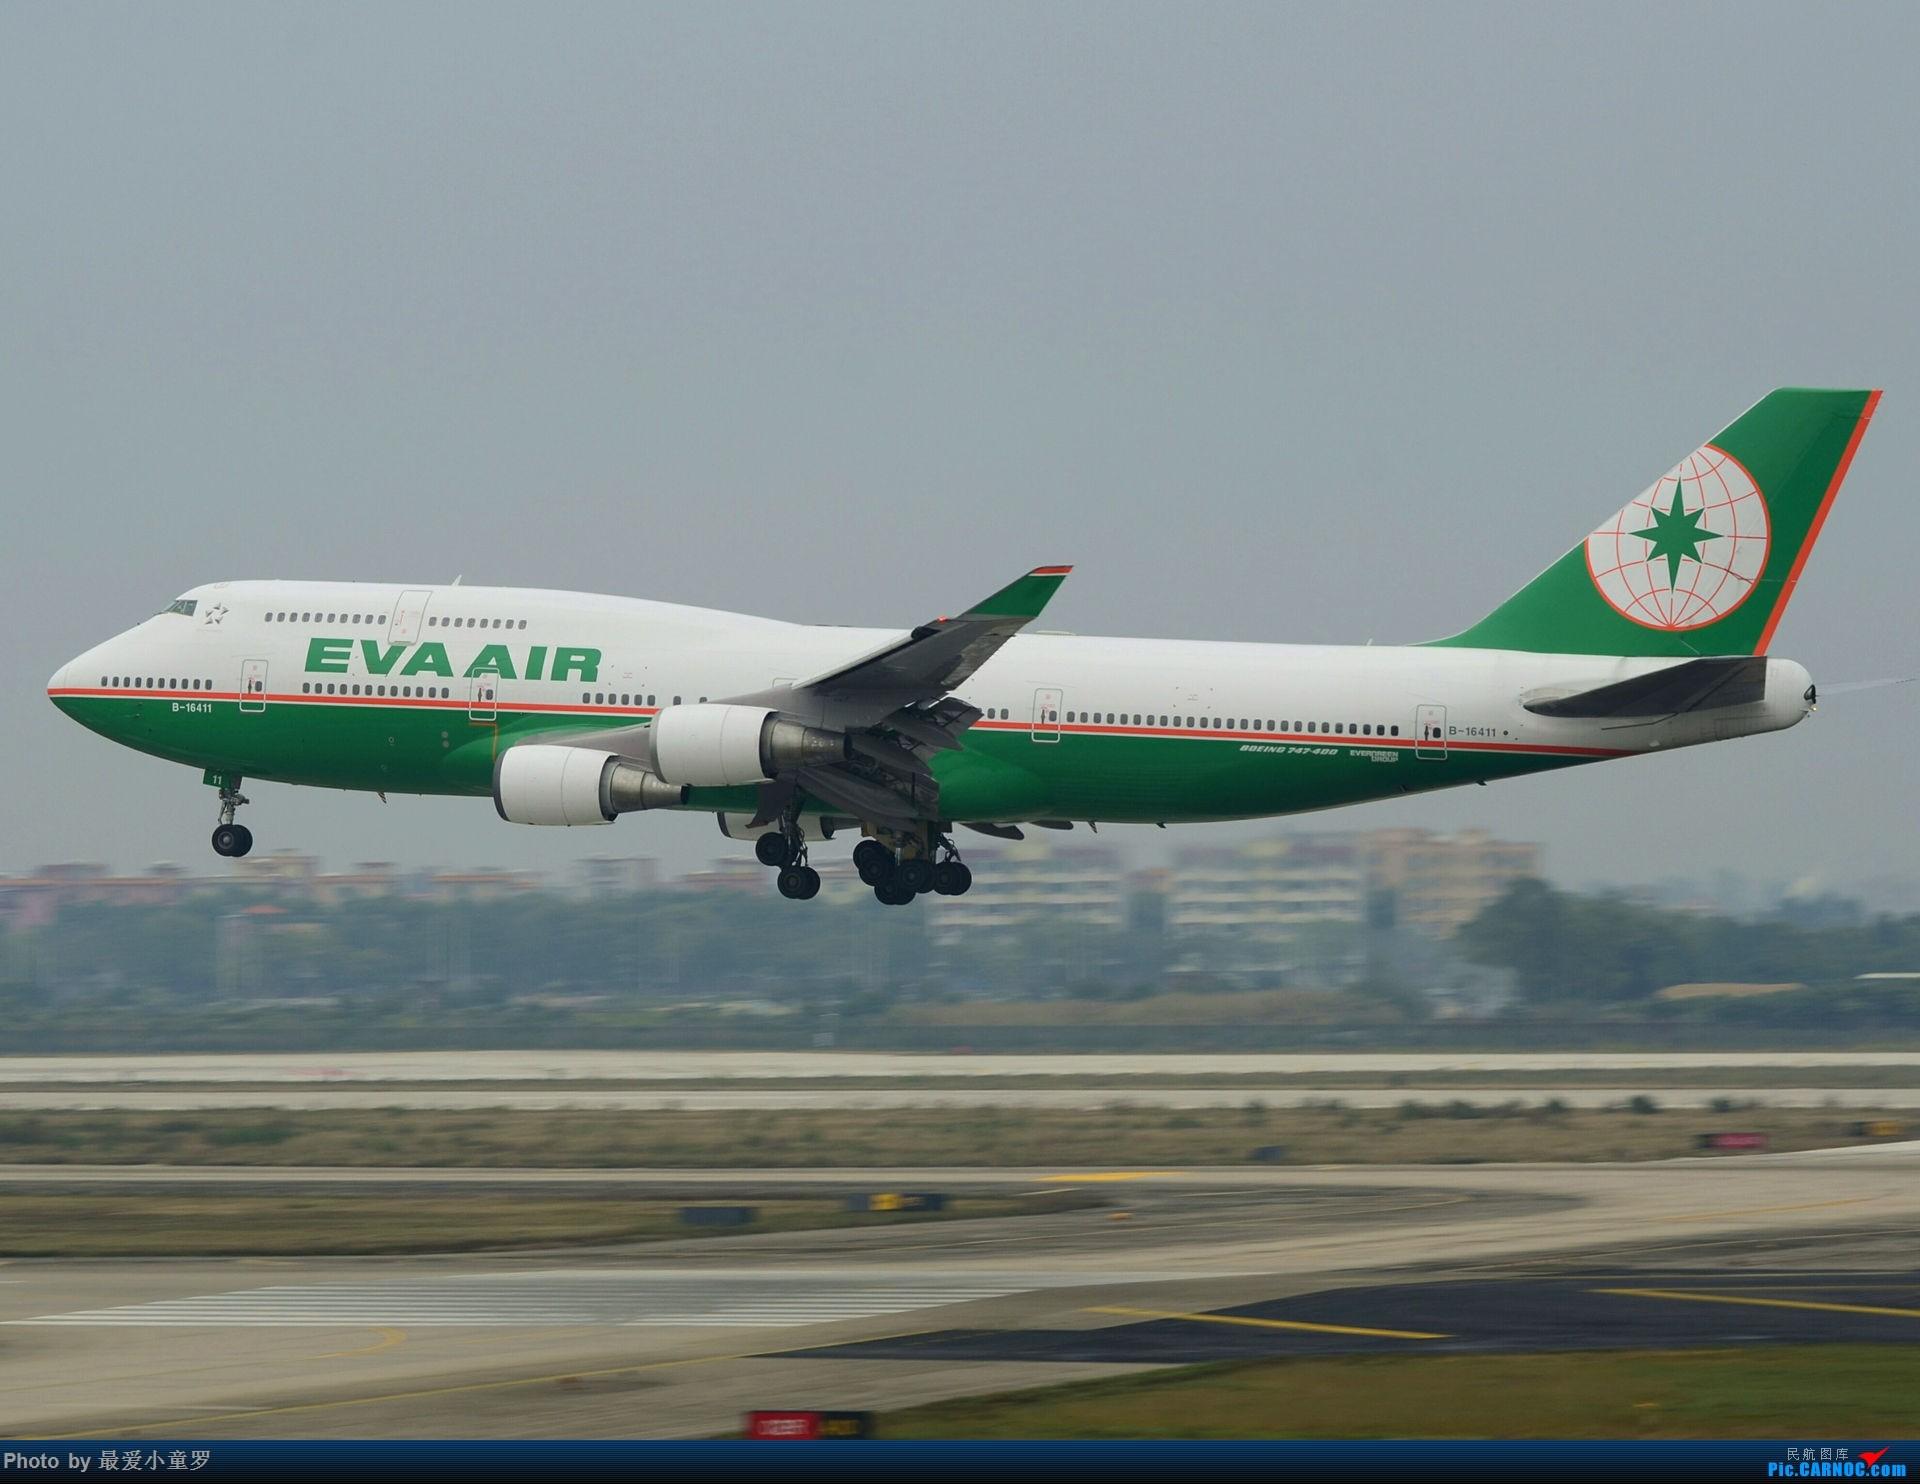 Re:[原创]旧的不去,新的不来——致2014远去的背影! BOEING 747-400 B-16411 中国广州白云国际机场